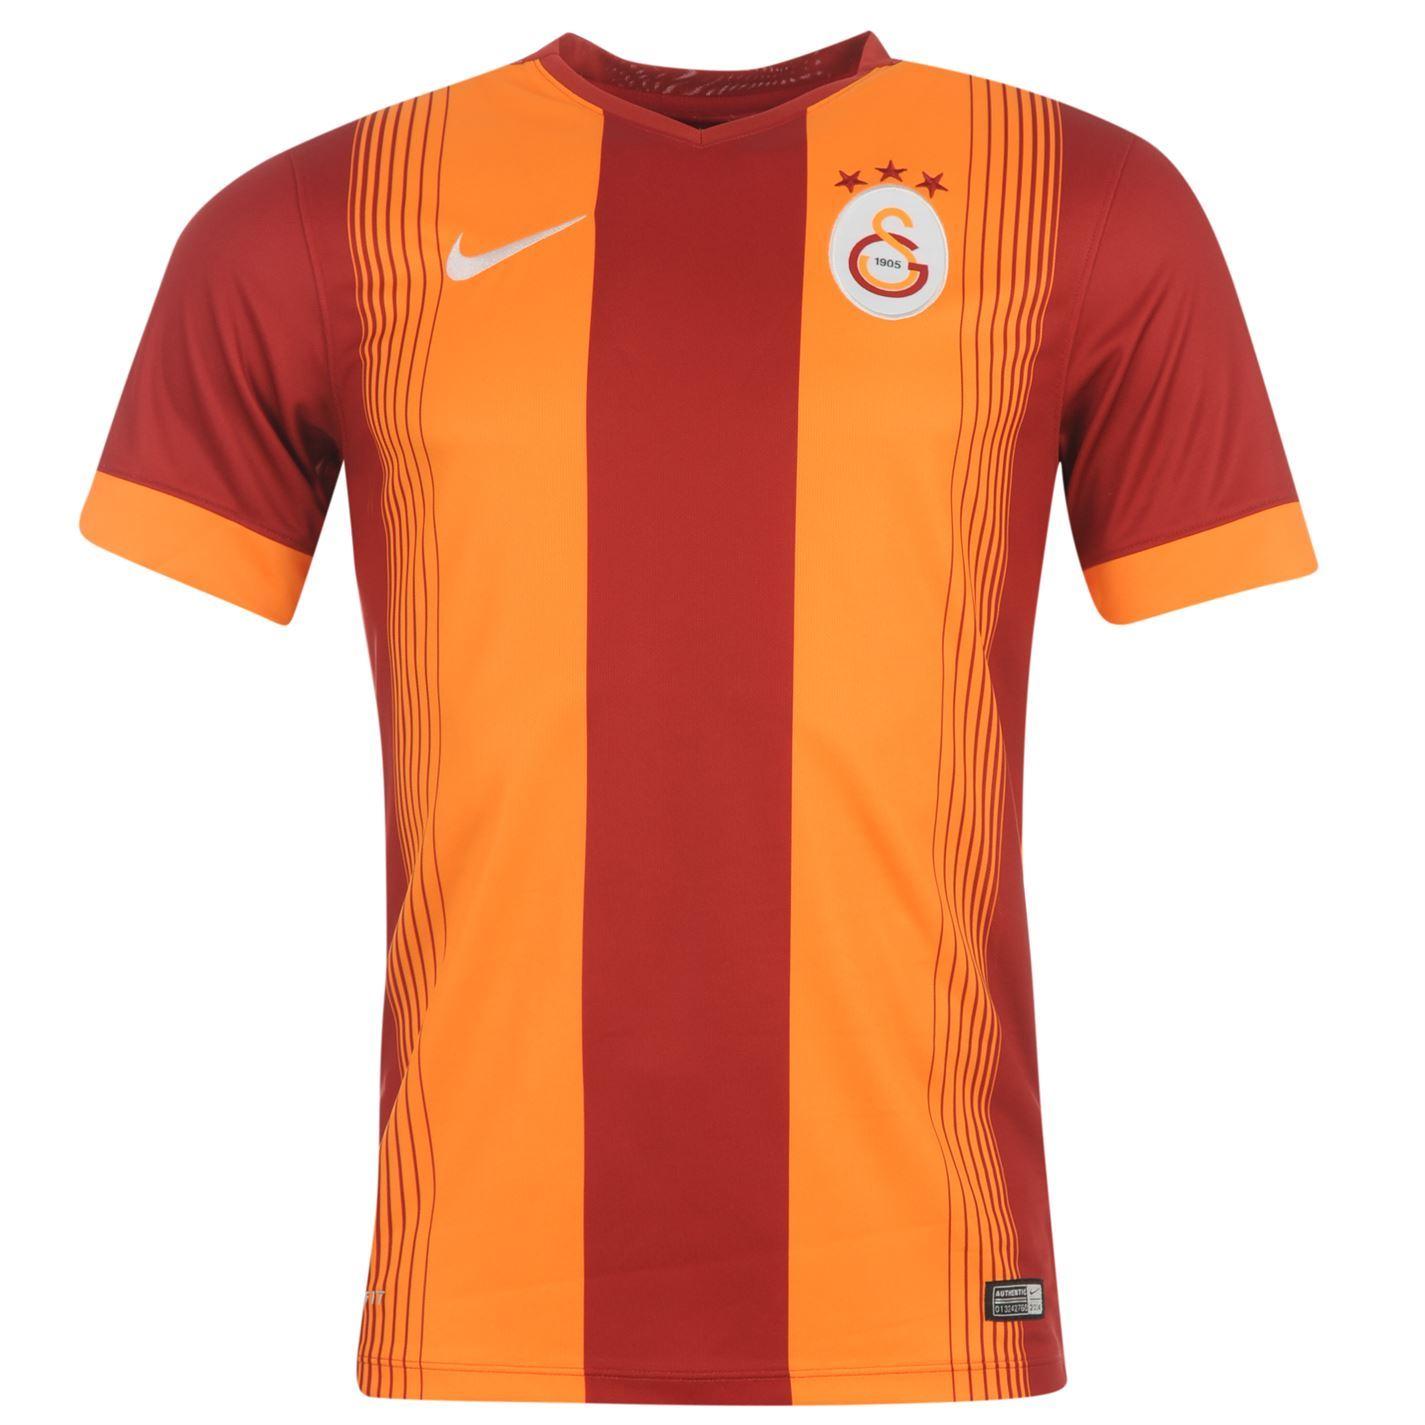 Nike Galatasaray Hogar Jersey 2014 2015 Juniors Niños Rojo/blanco de ...